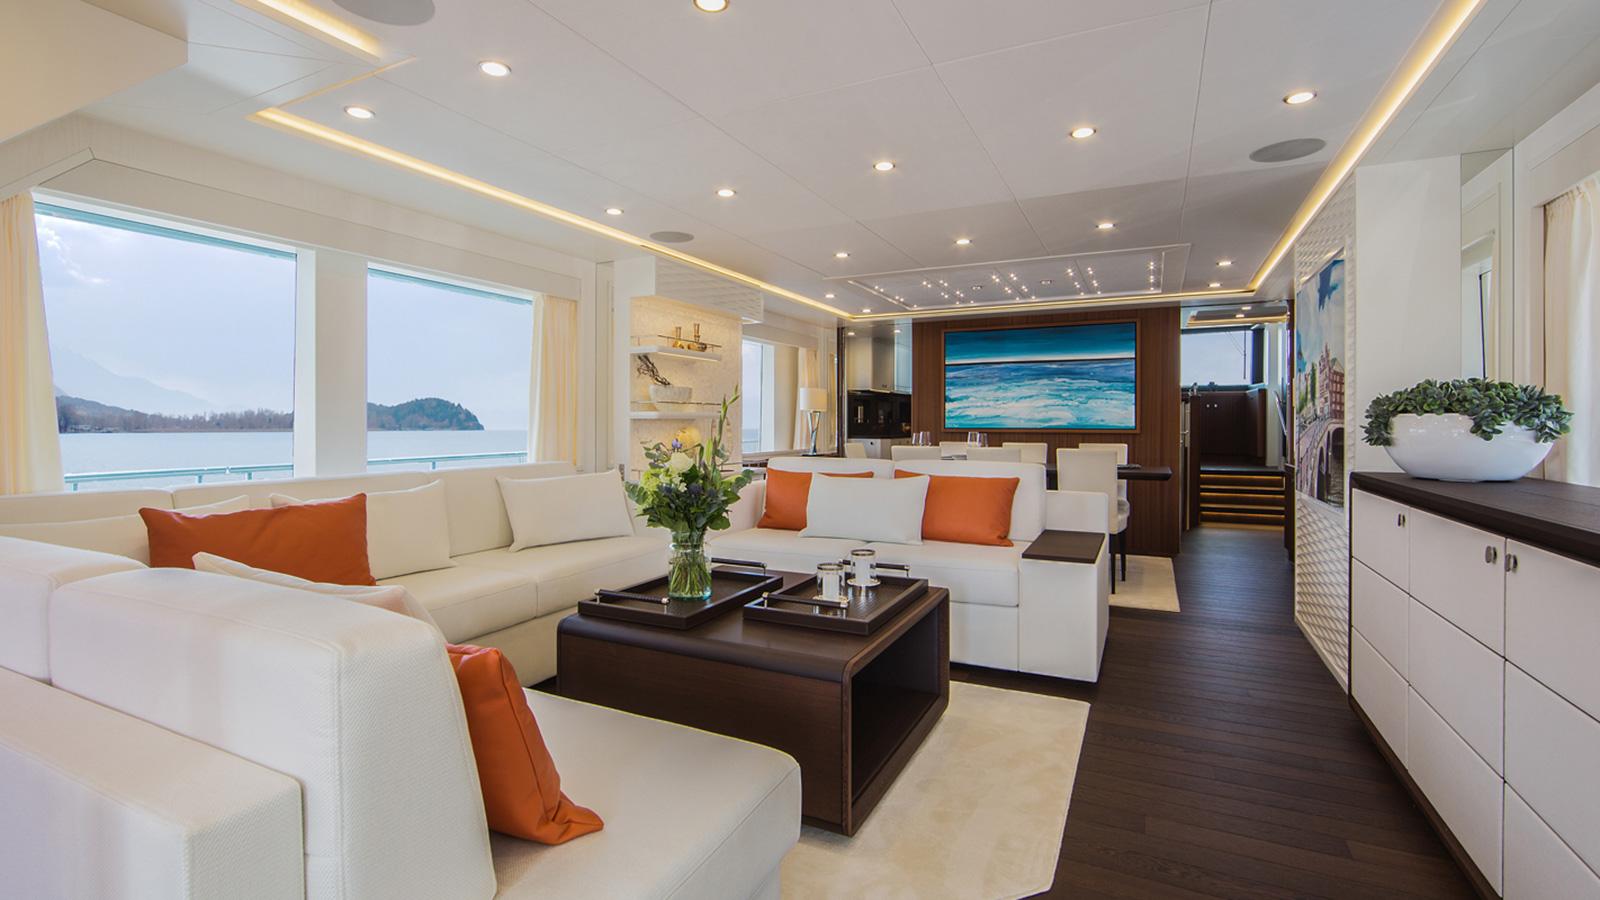 the-saloon-of-the-van-der-valk-explorer-yacht-dutch-falcon